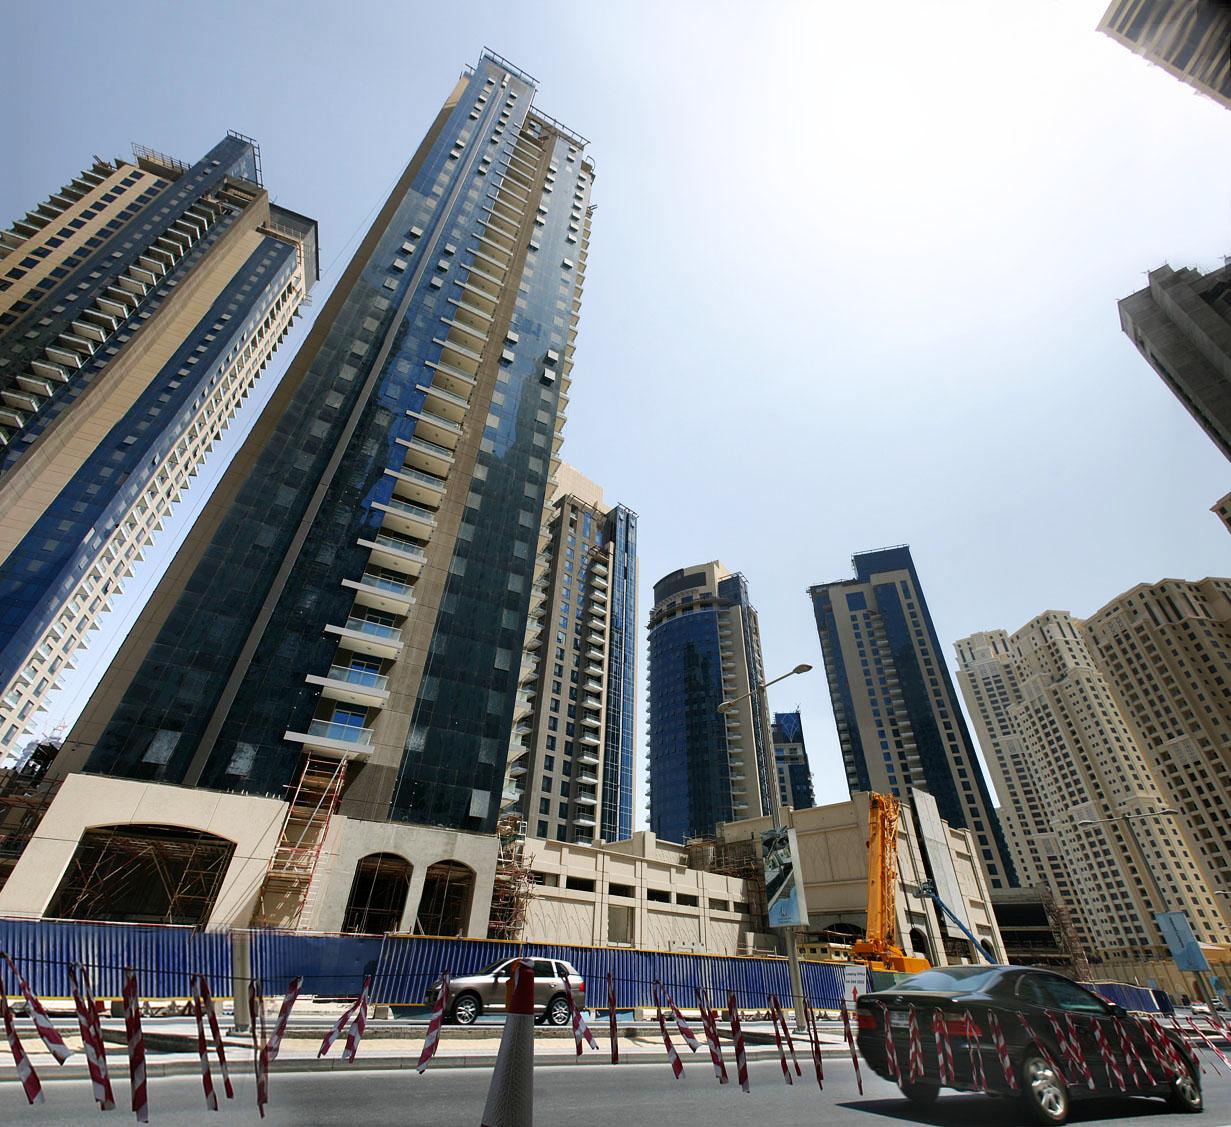 Ihram Kids For Sale Dubai: Dubai Marina Real Estate Apartment Apartments Real Estate